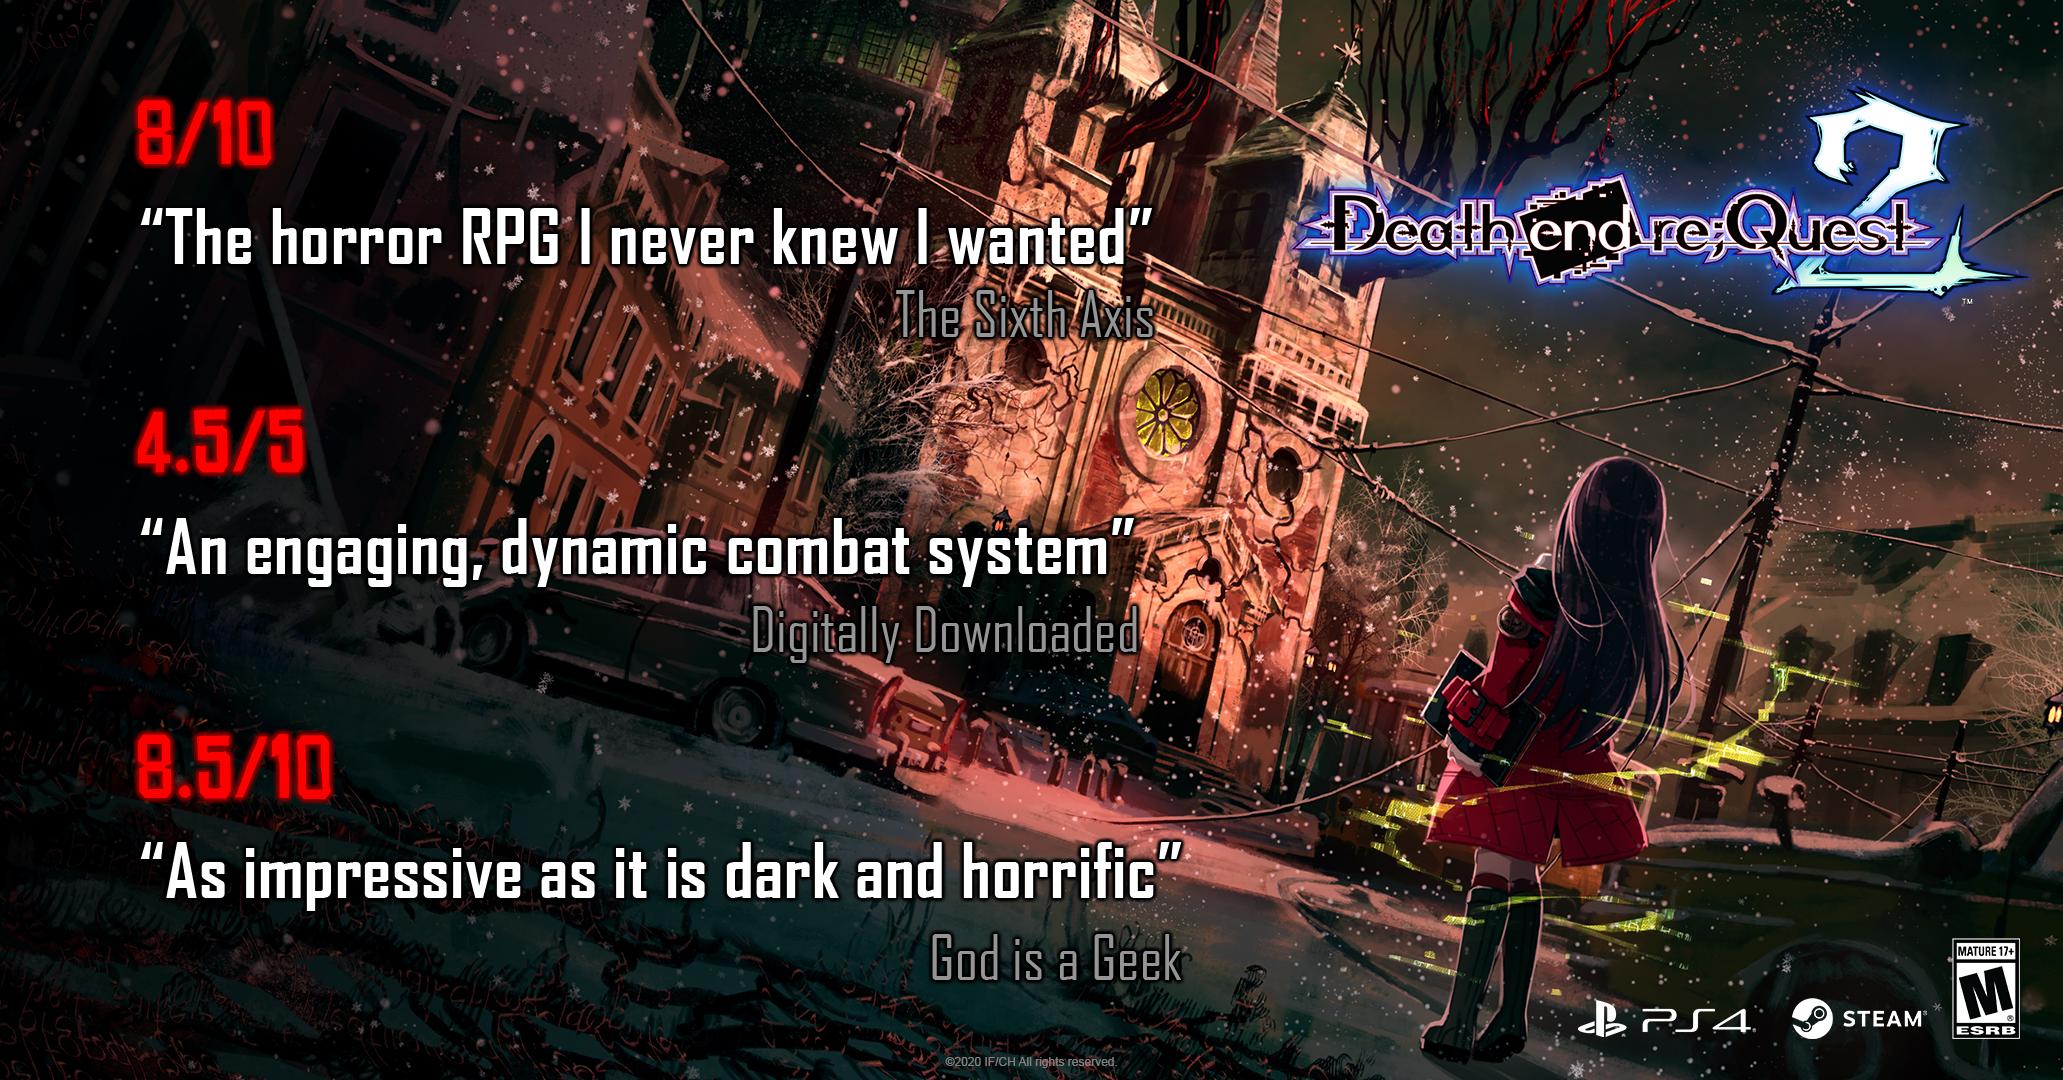 derq2-reviews-online-store.png